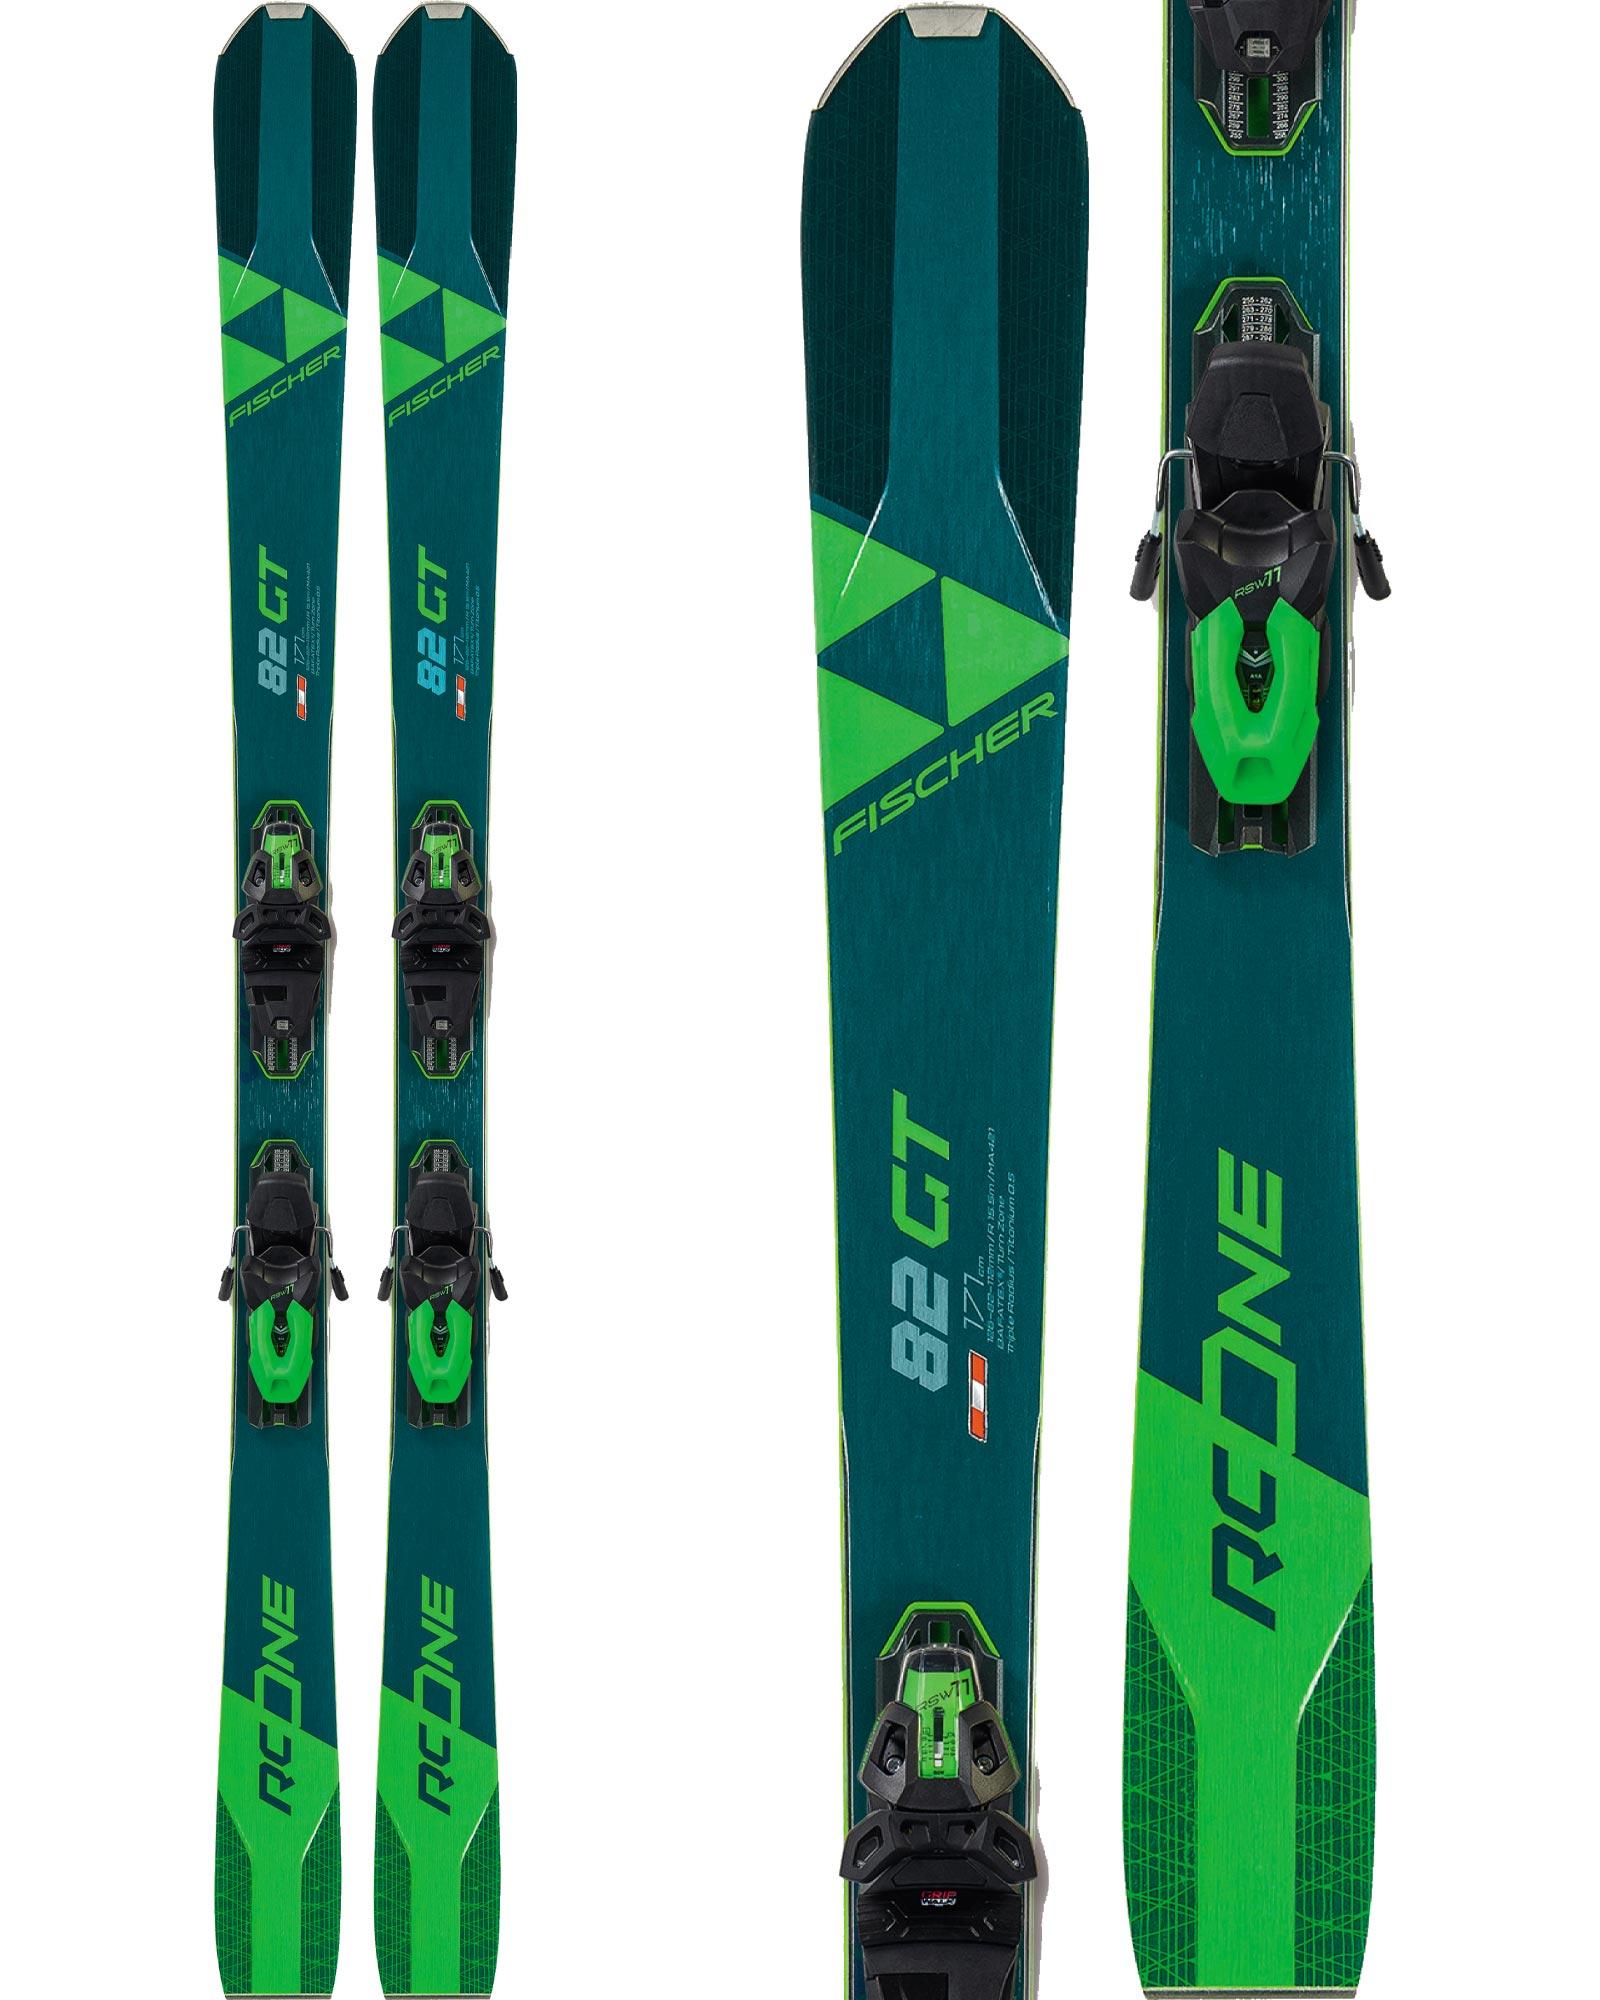 Fischer Men's RC One 82 GT All Mountain Skis + RSW 11 GW Powerrail Brake 85 Bindings 2020 / 2021 0